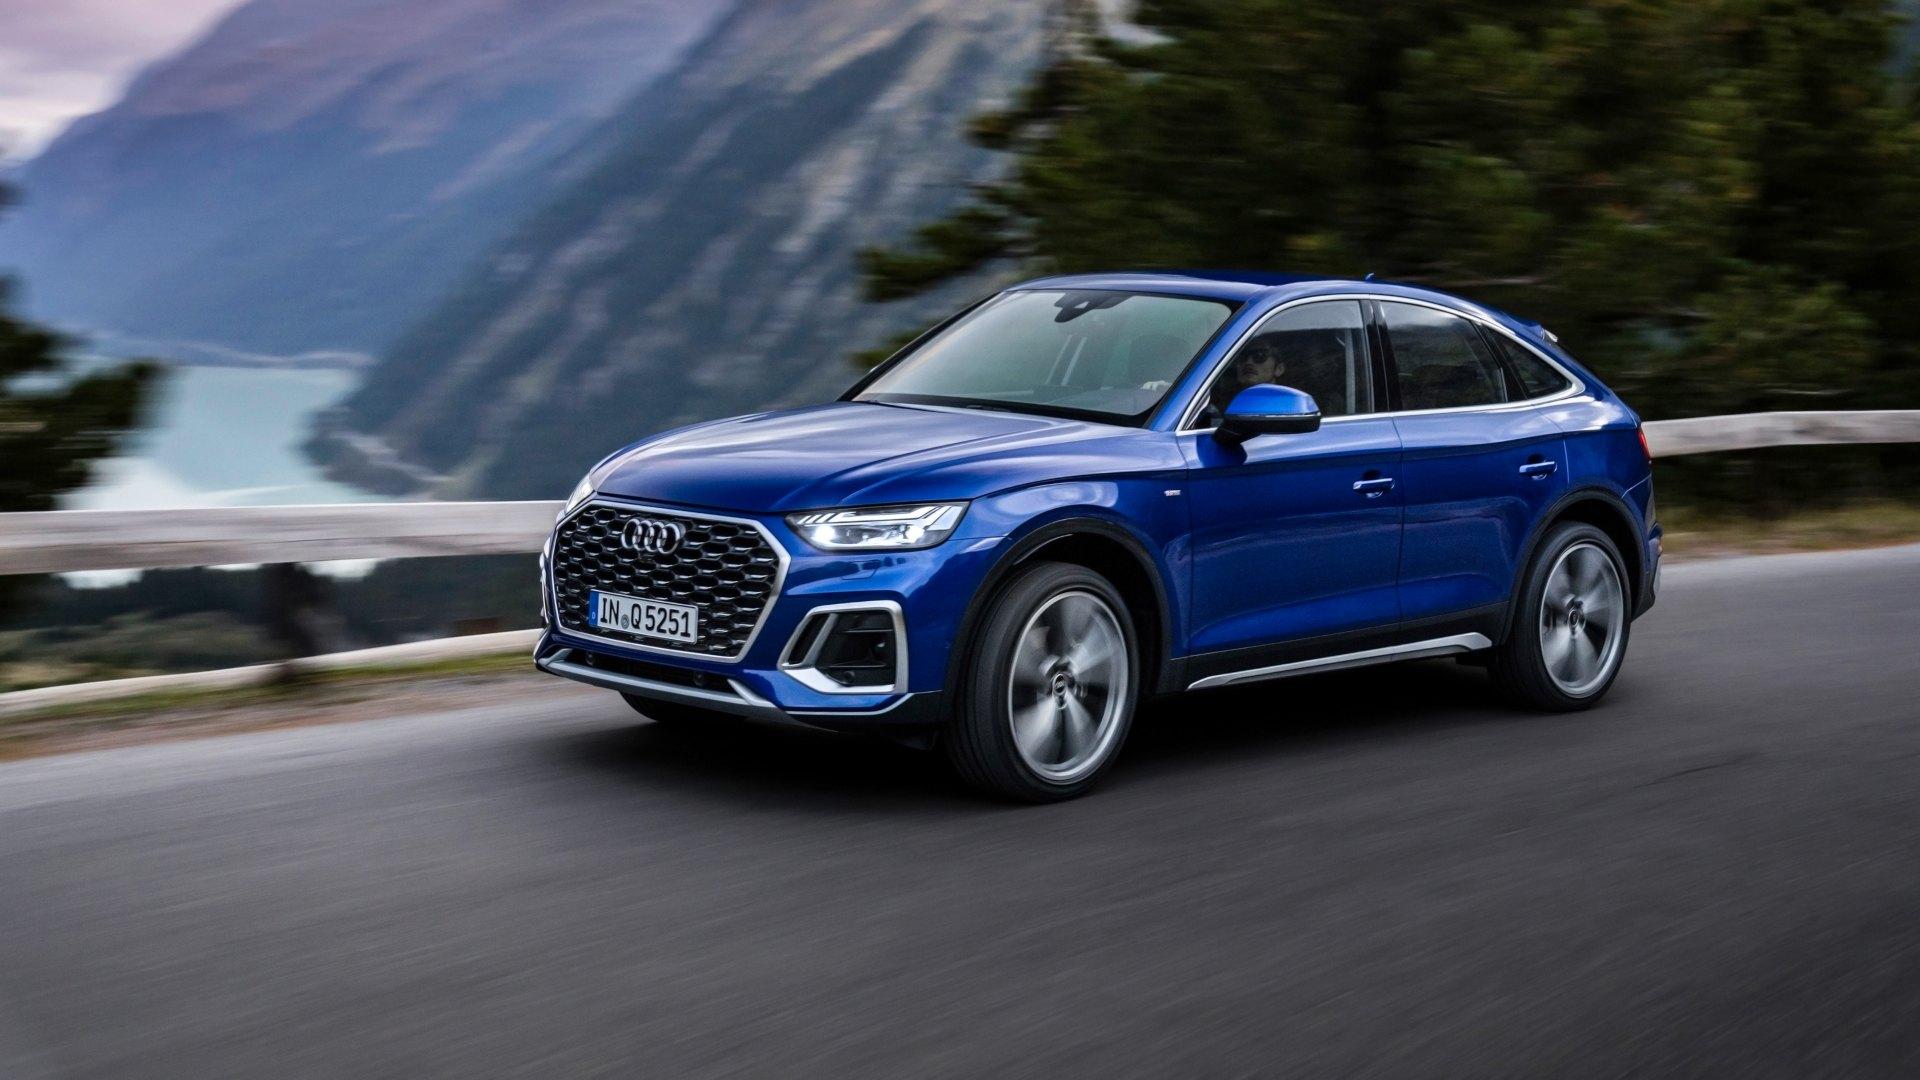 Se ponen a la venta los Audi Q5 Sportback y Audi SQ5 Sportback TDI